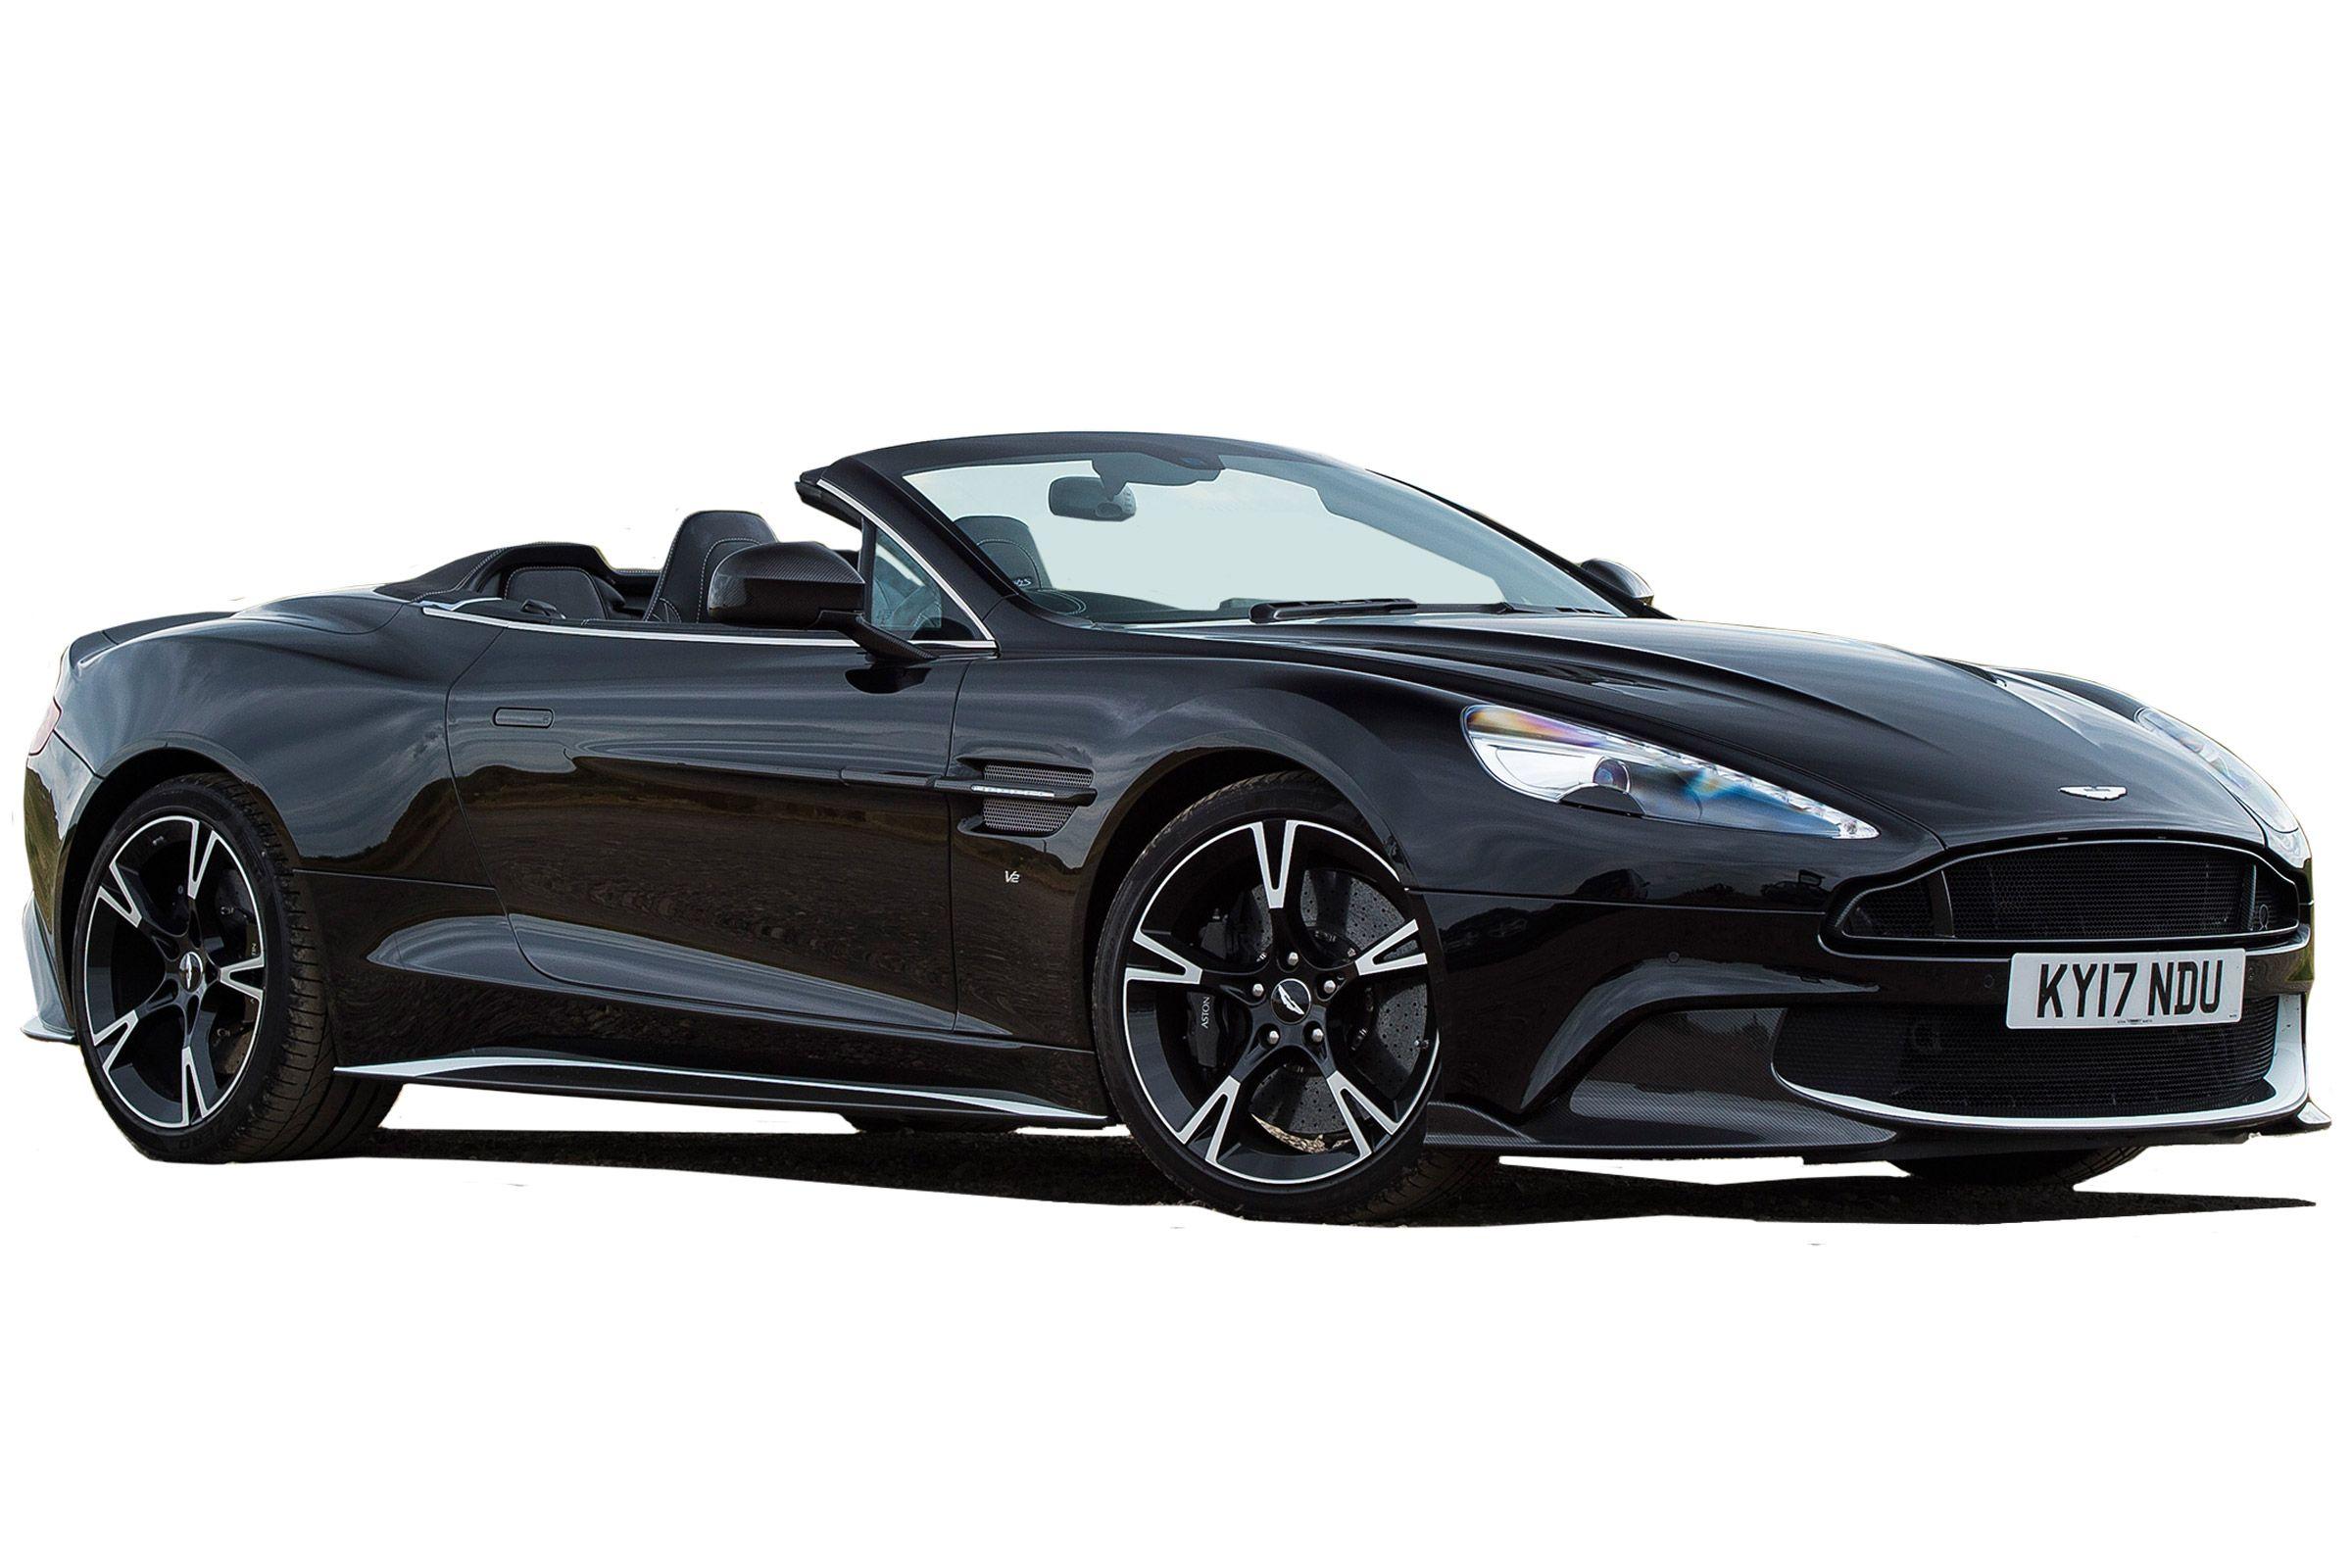 Aston Martin Vanquish Volante Aston Martin & Lagonda